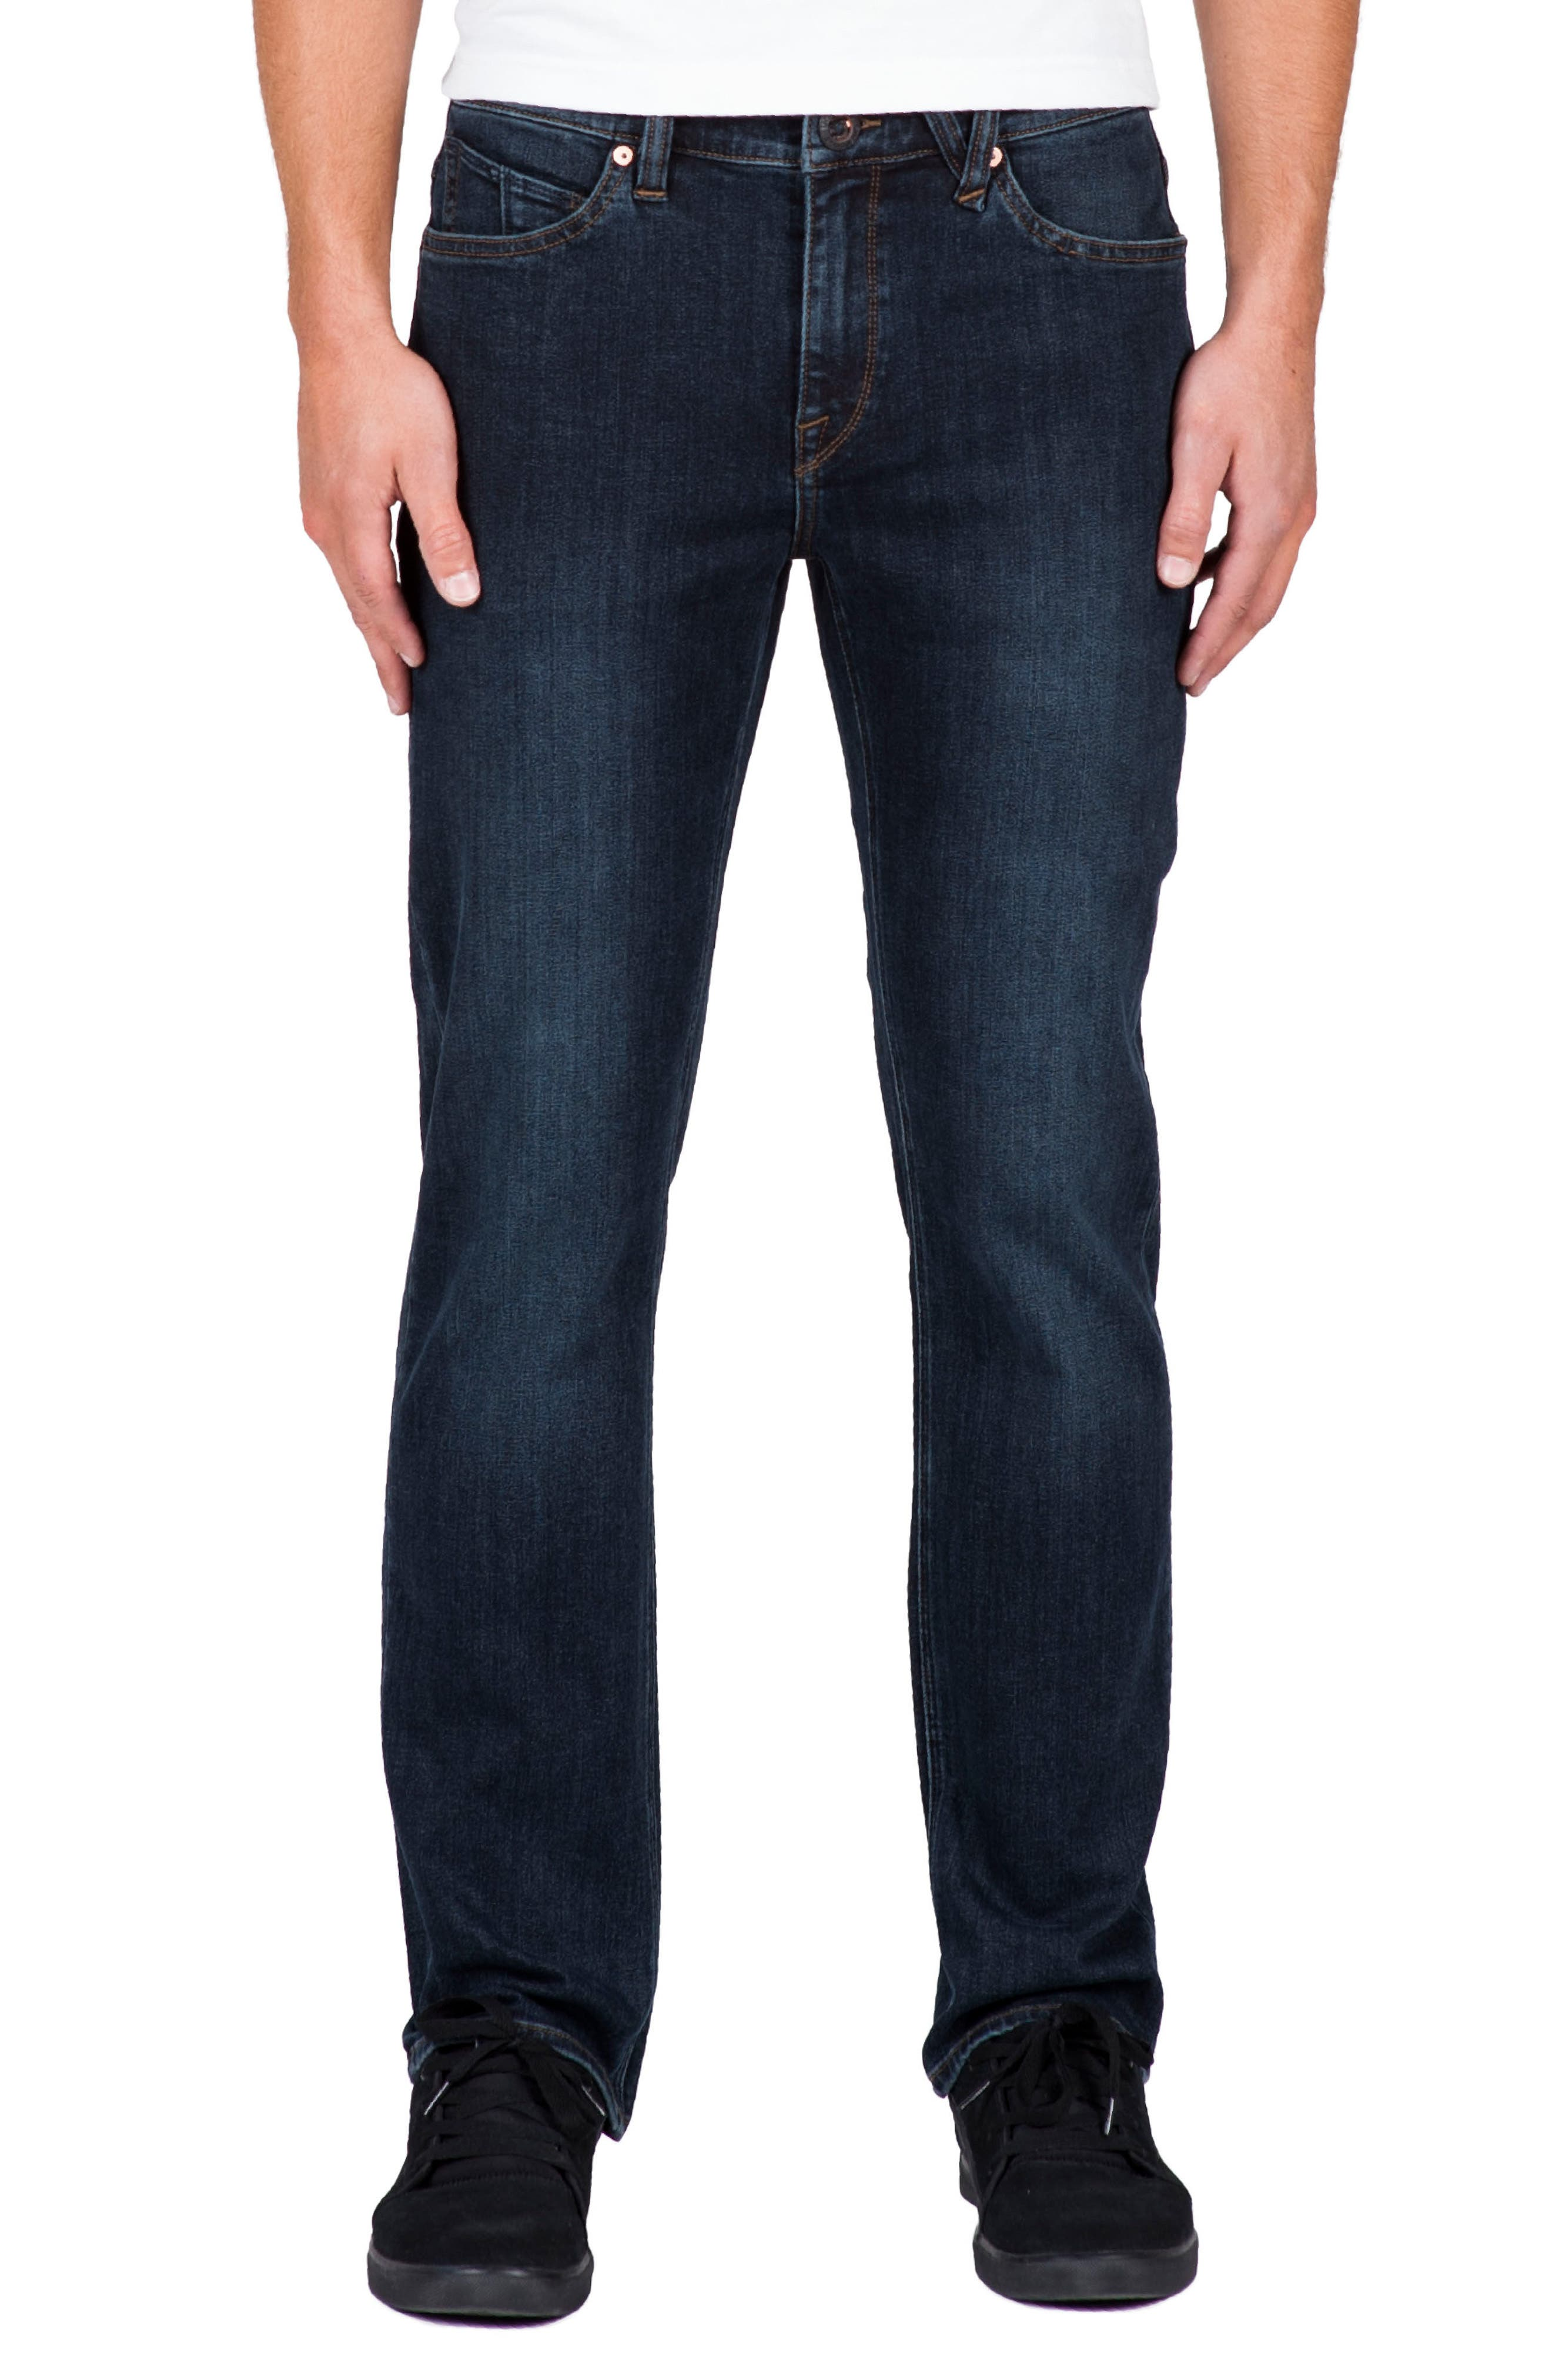 'Solver' Straight Leg Jeans,                             Main thumbnail 1, color,                             Blue Vnt